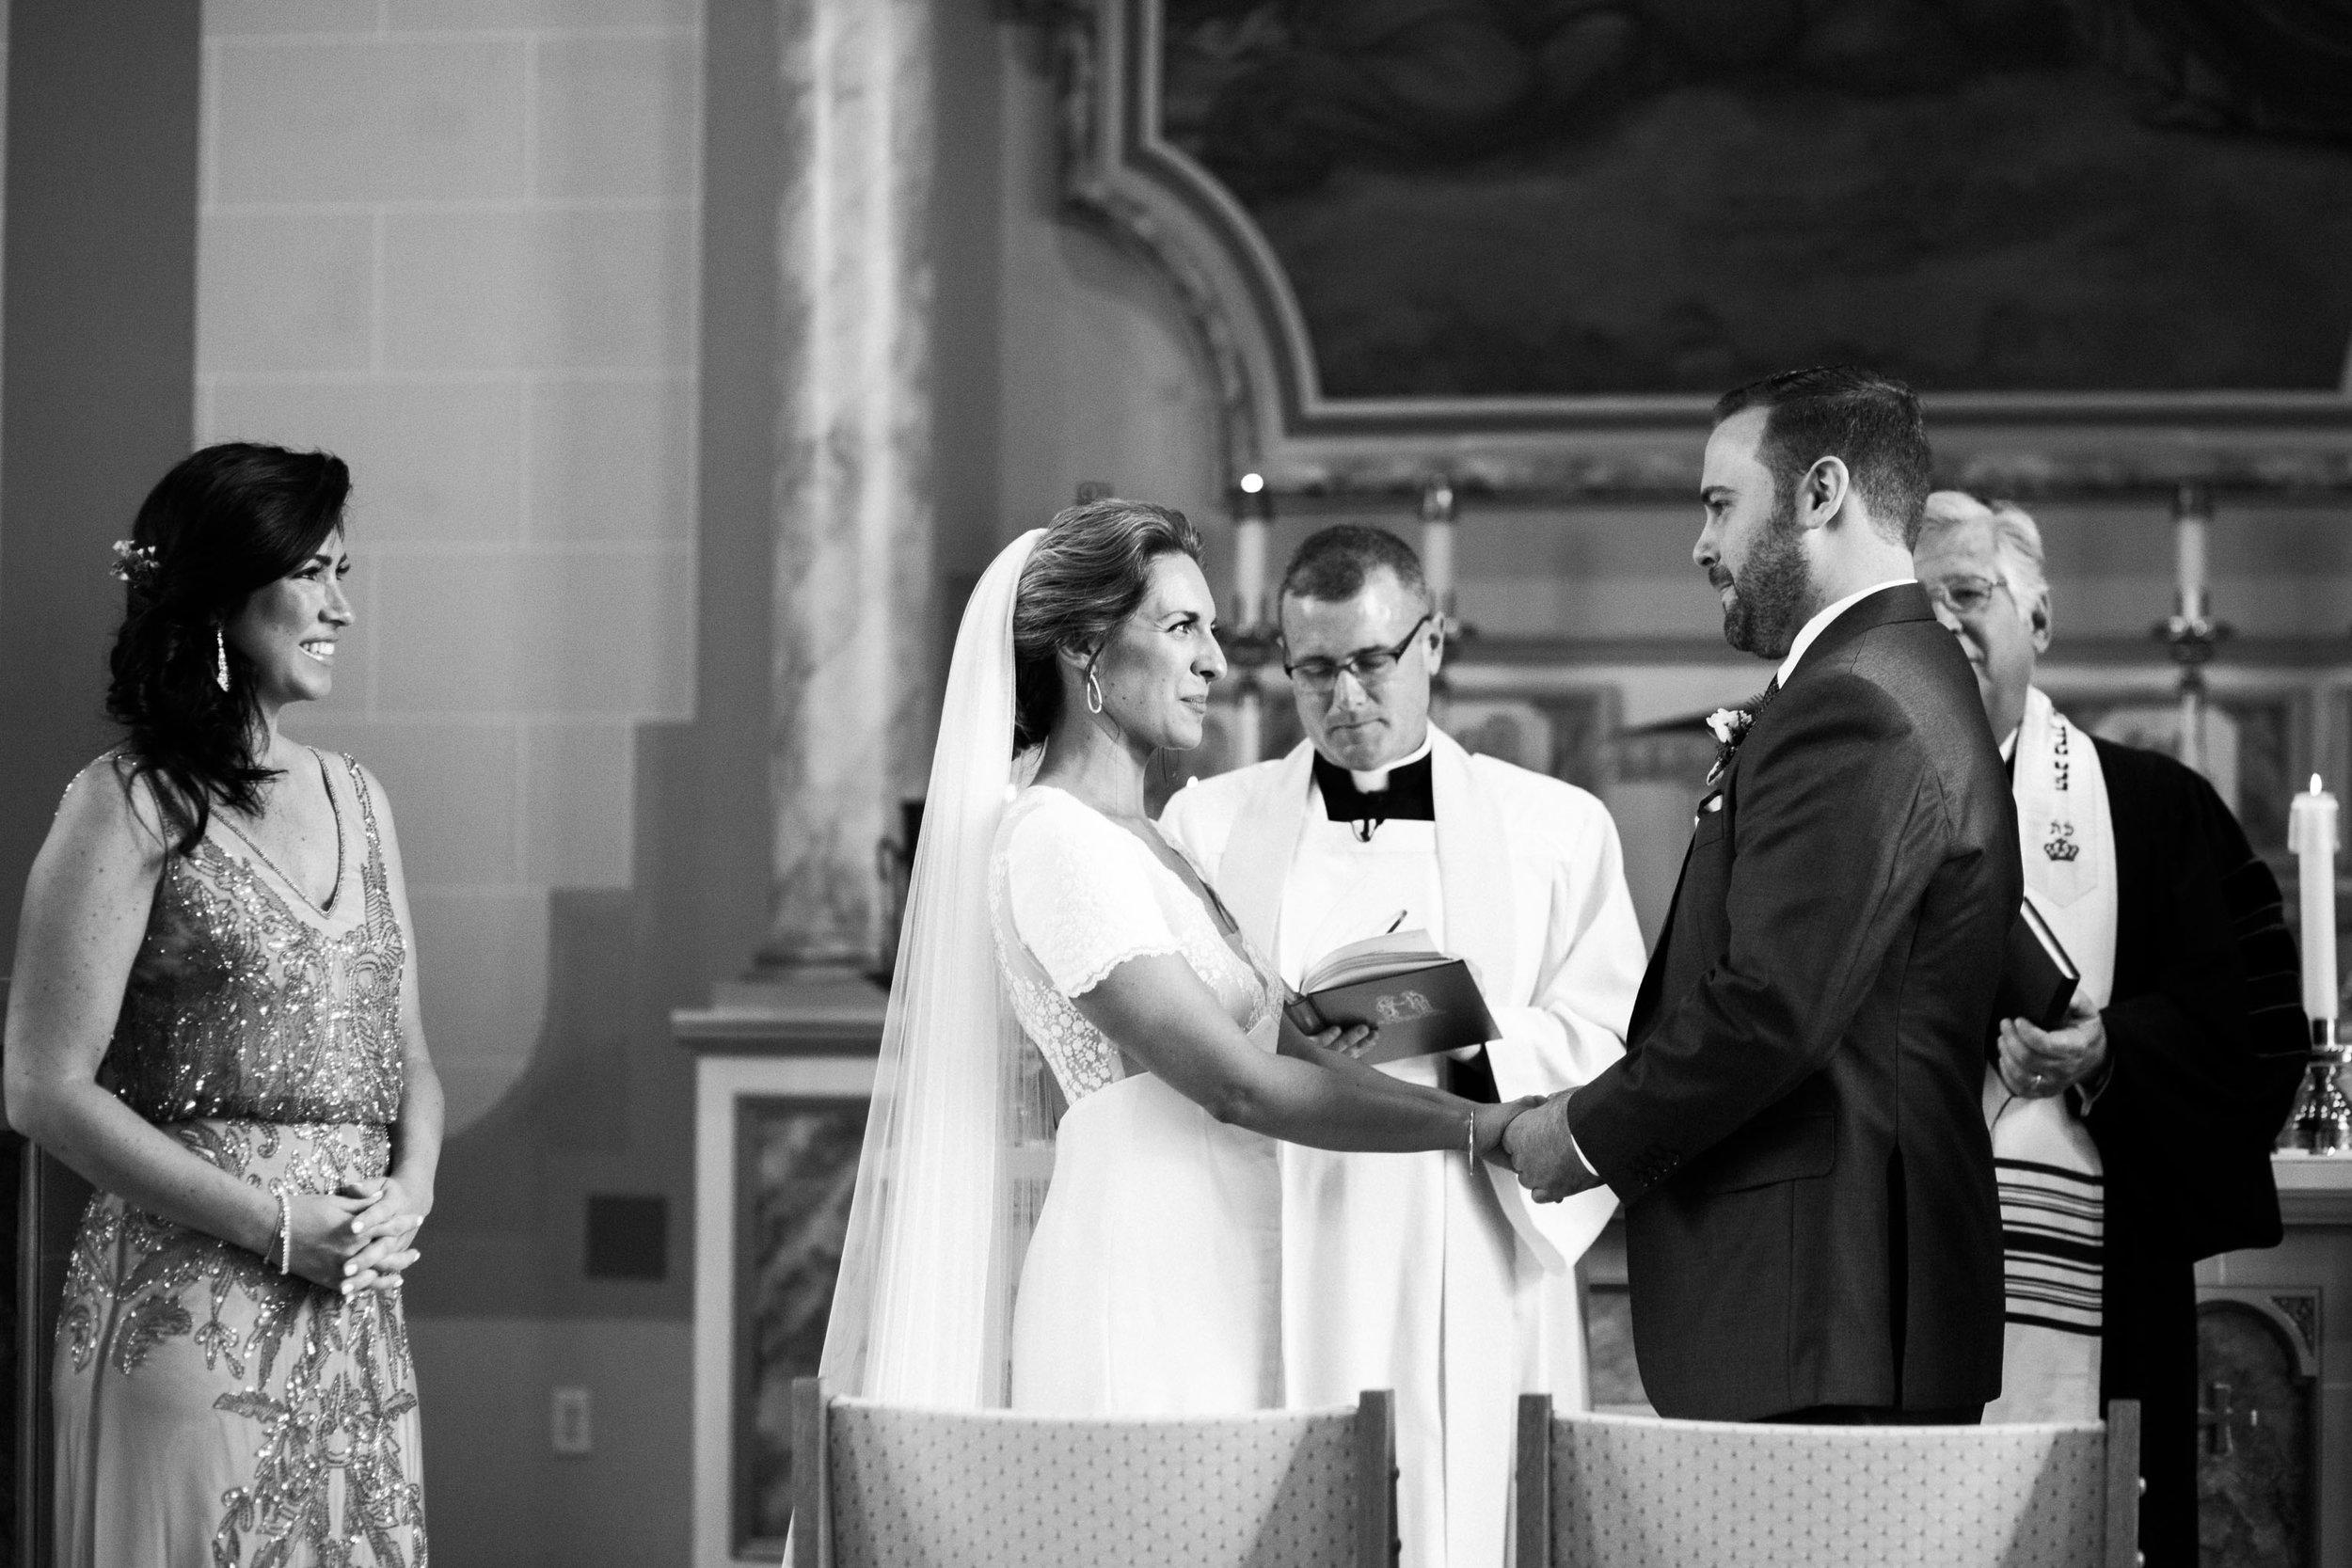 HiloandGinger-Brian+Dina_Weddingday_SneakPeek-26.jpg